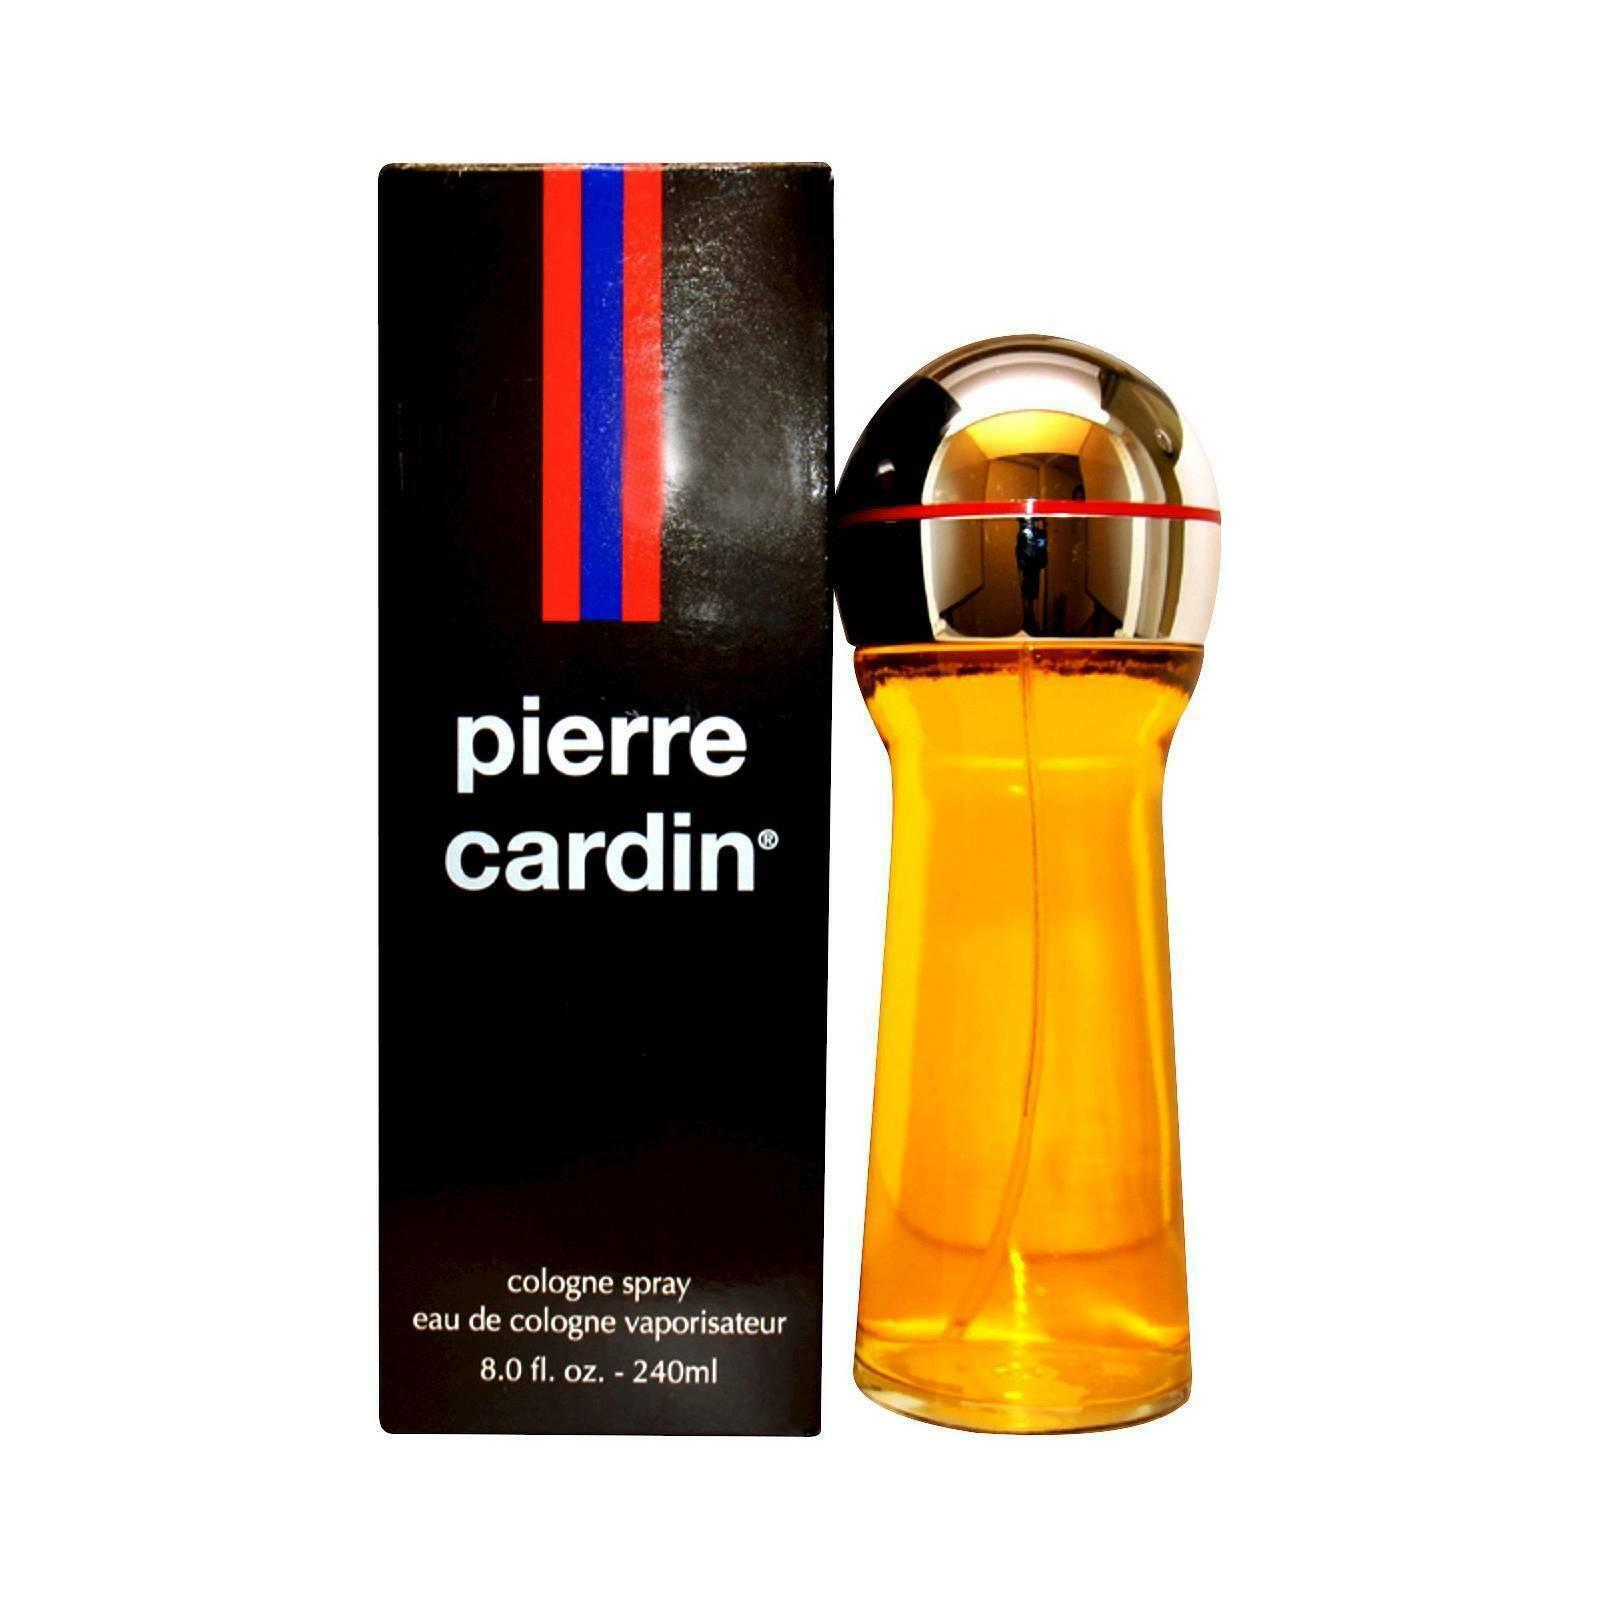 7143de8e17e5 Pierre Cardin Cologne Spray 240ml